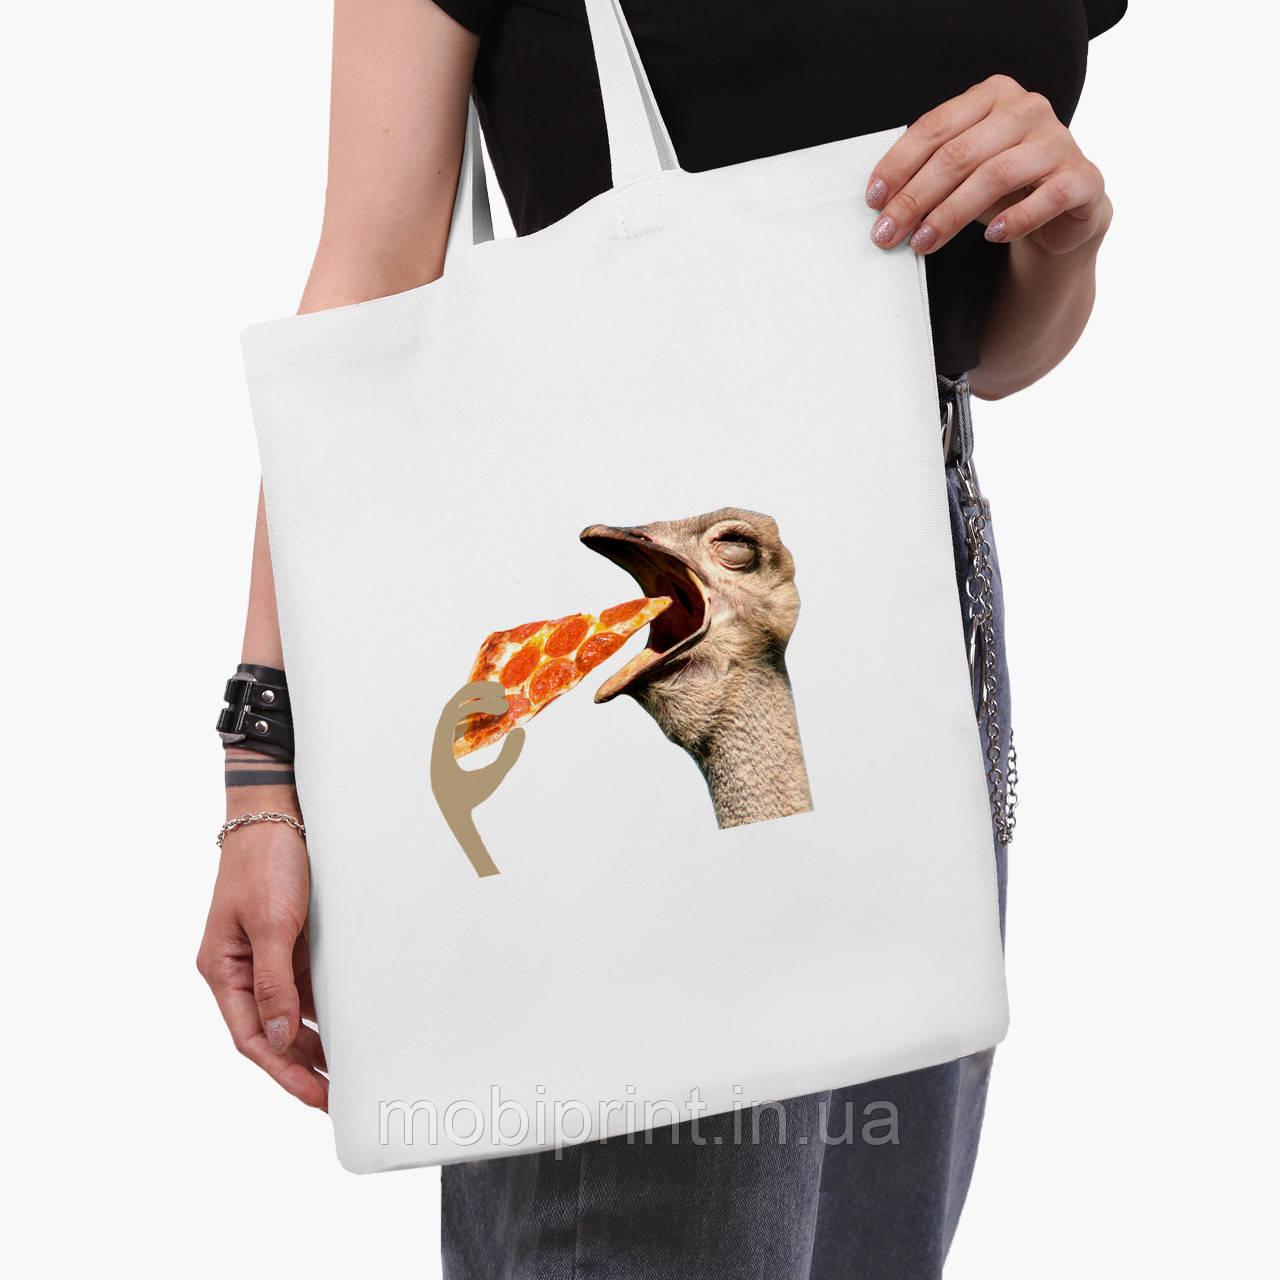 Еко сумка шоппер біла Птаха SWAG (9227-1541-3) 41*35 см